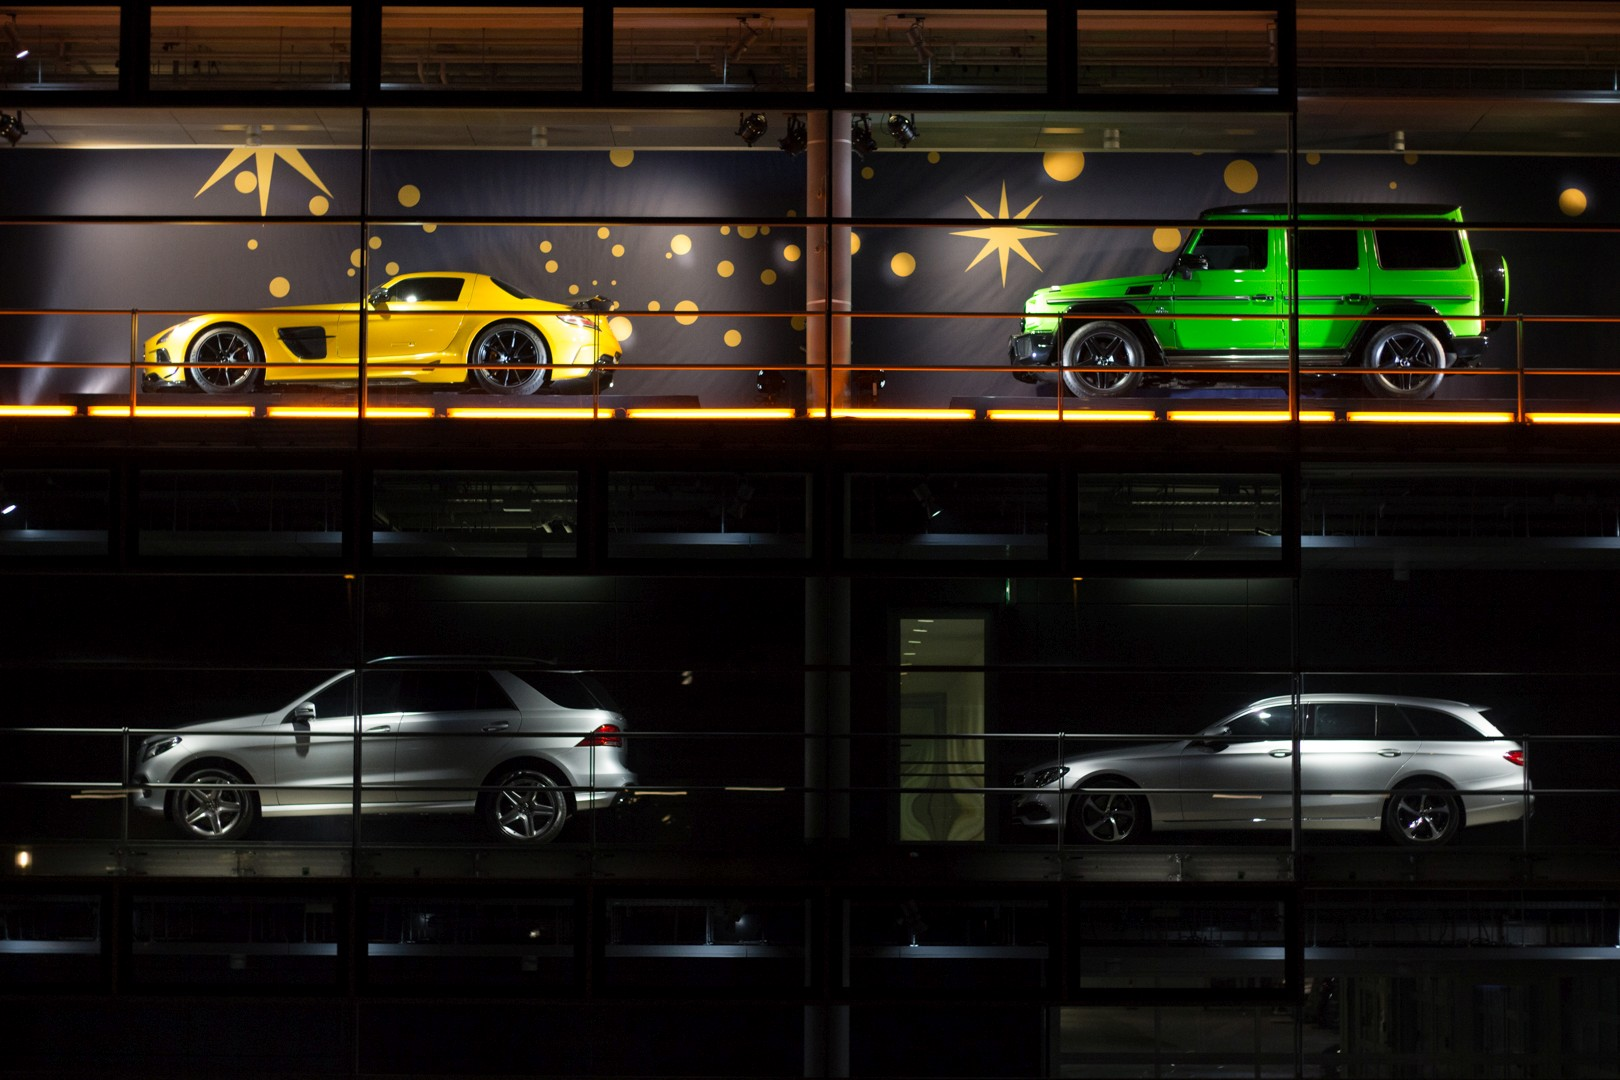 Sretan vam Božić uz automobilski adventski kalendar